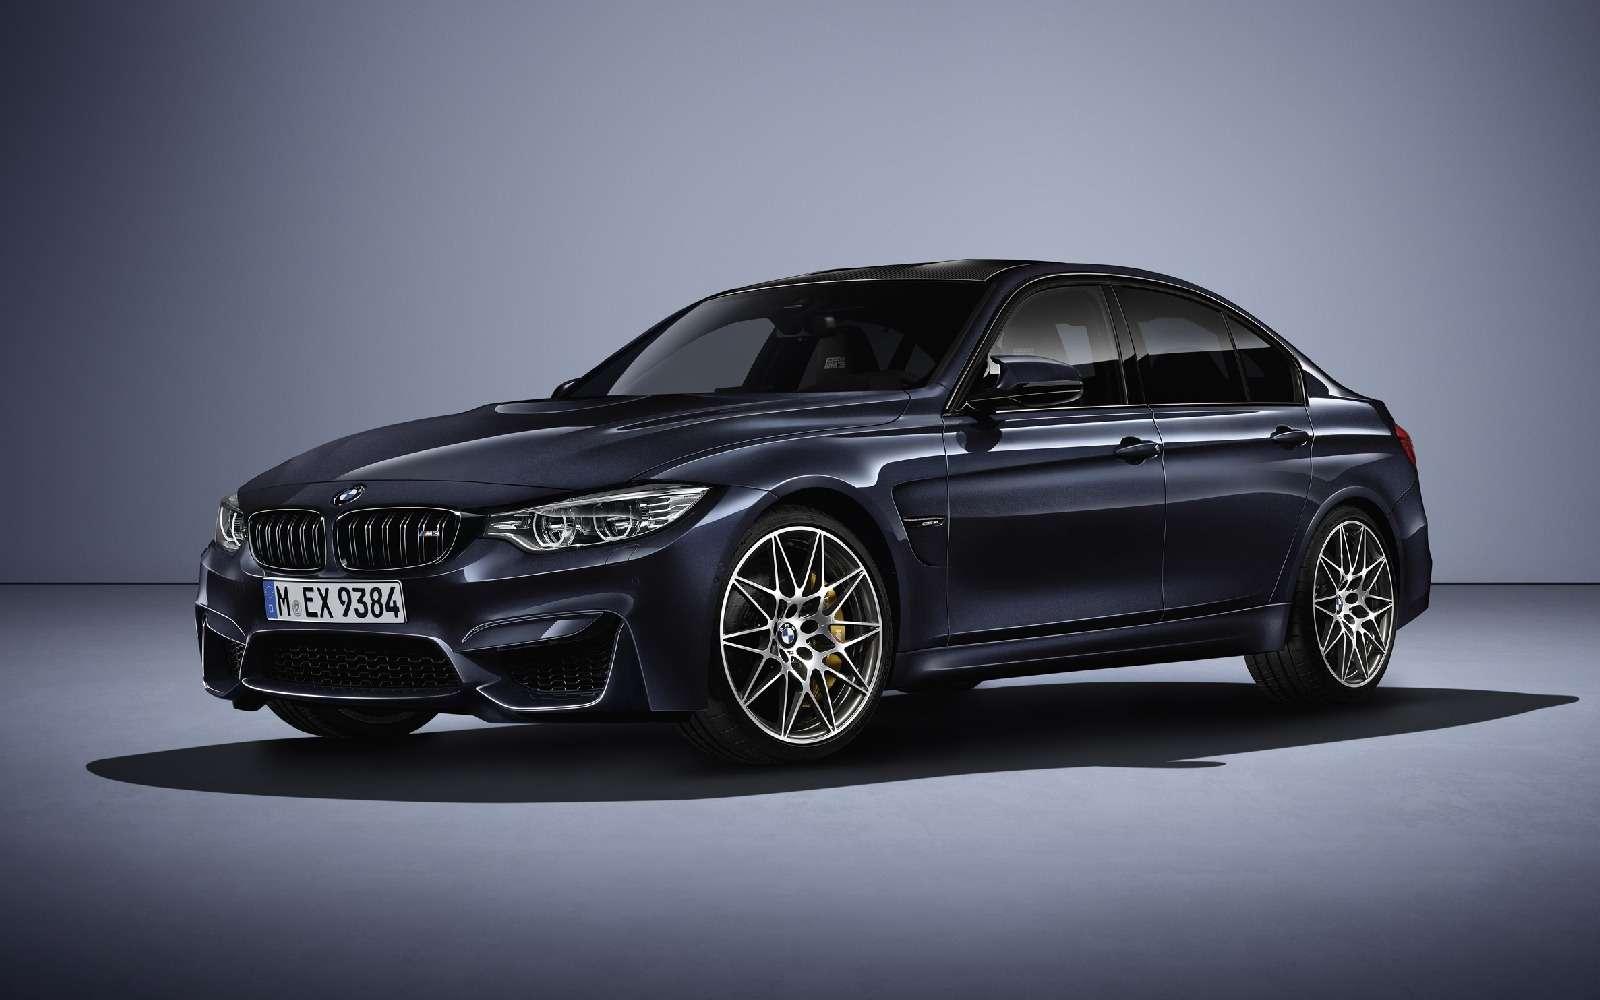 BMWM3отпразднует 30-летний юбилей с«лишними» дверьми— фото 593115